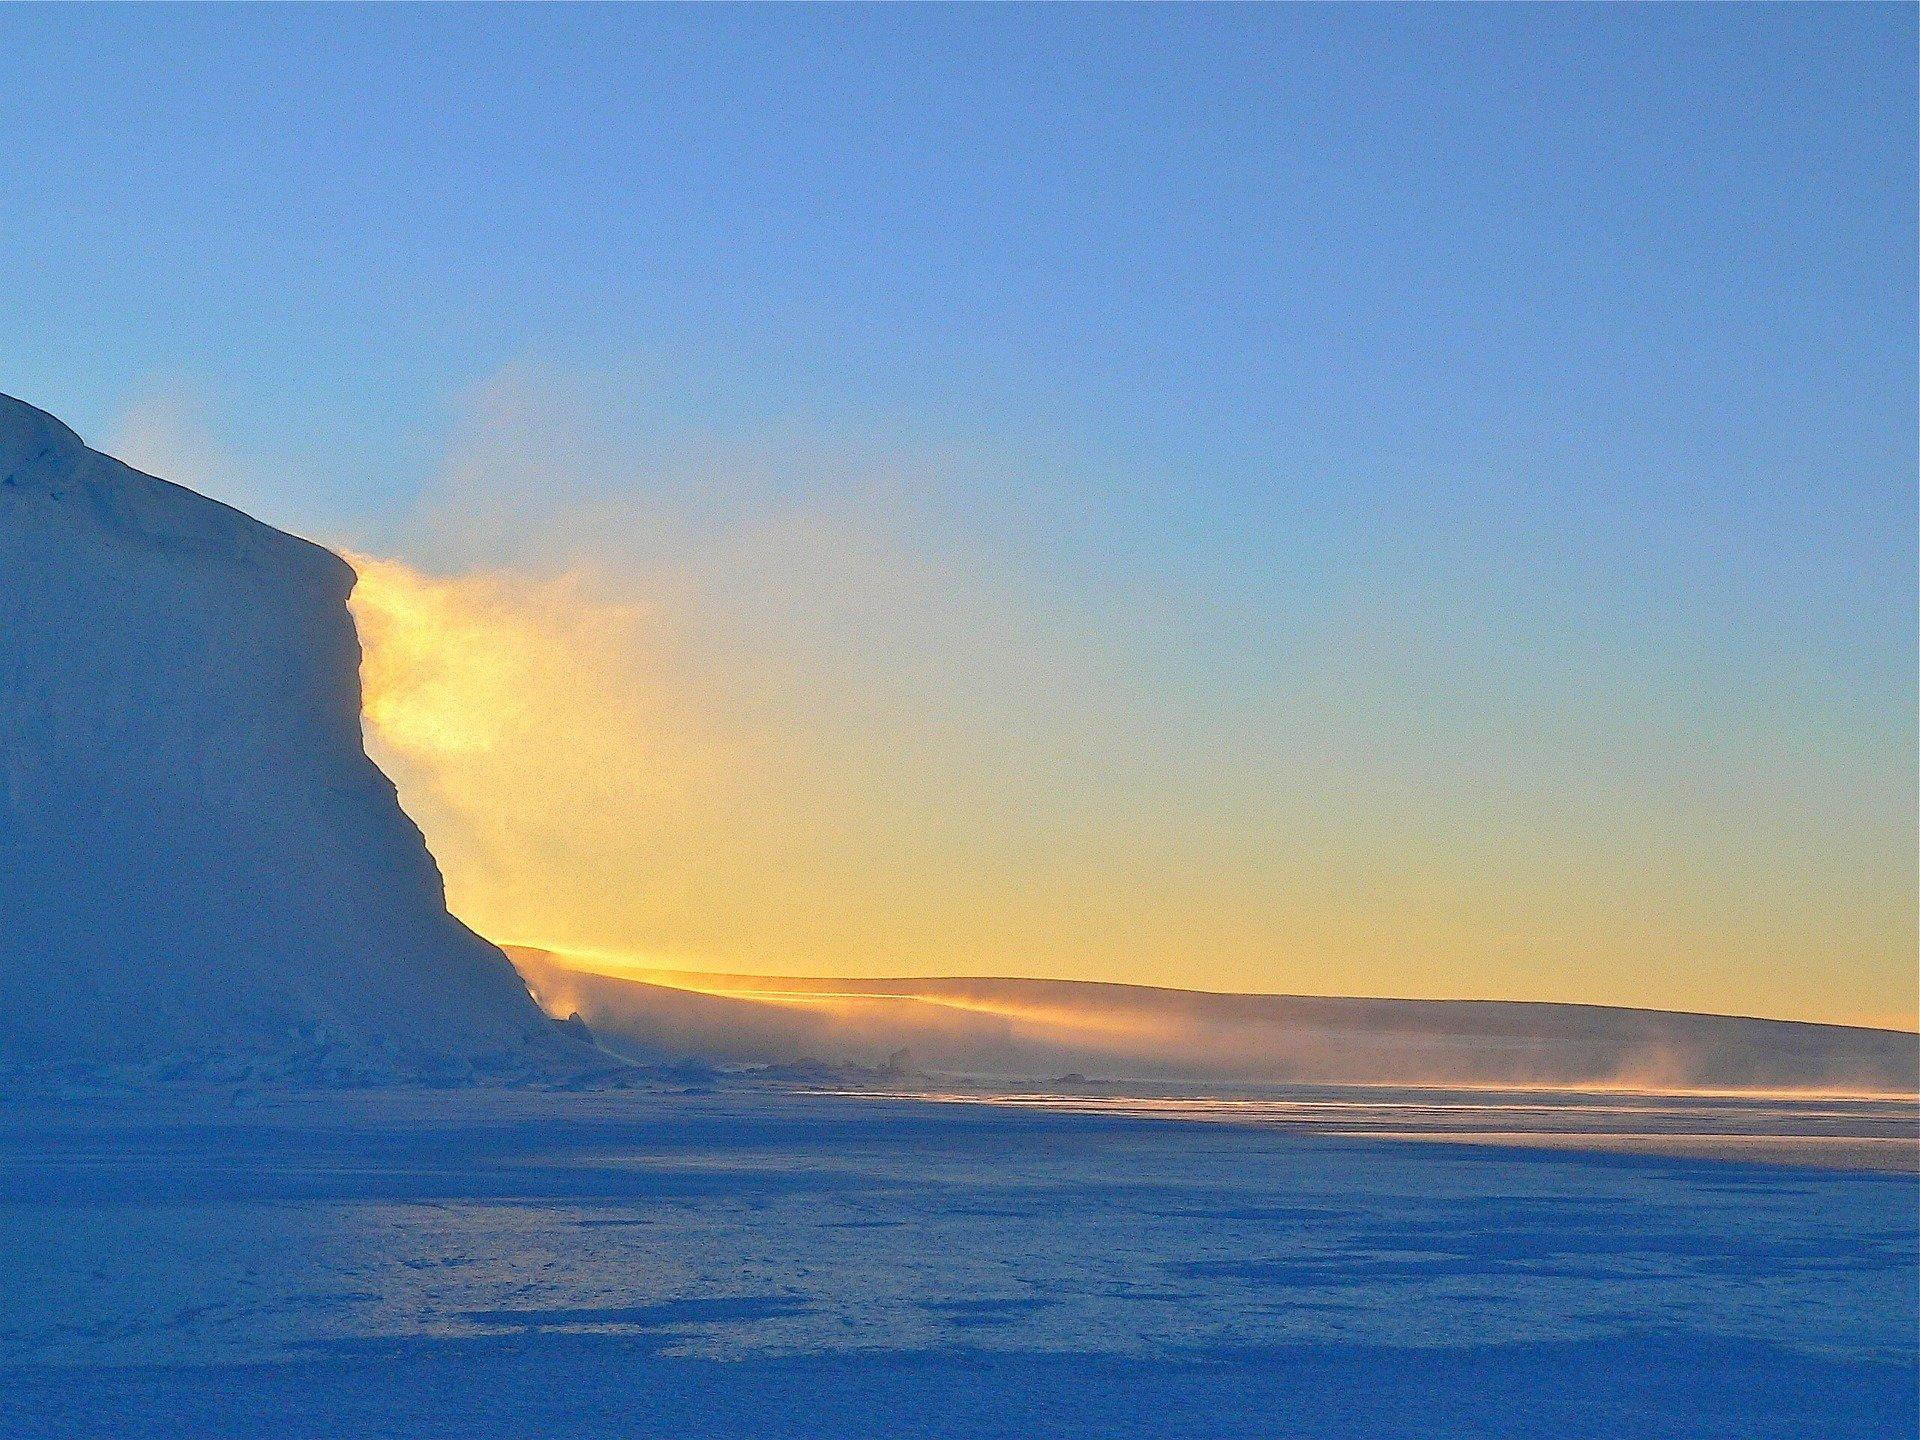 Ozone depletion increases Antarctic snowfall, partially mitigates ice sheet loss